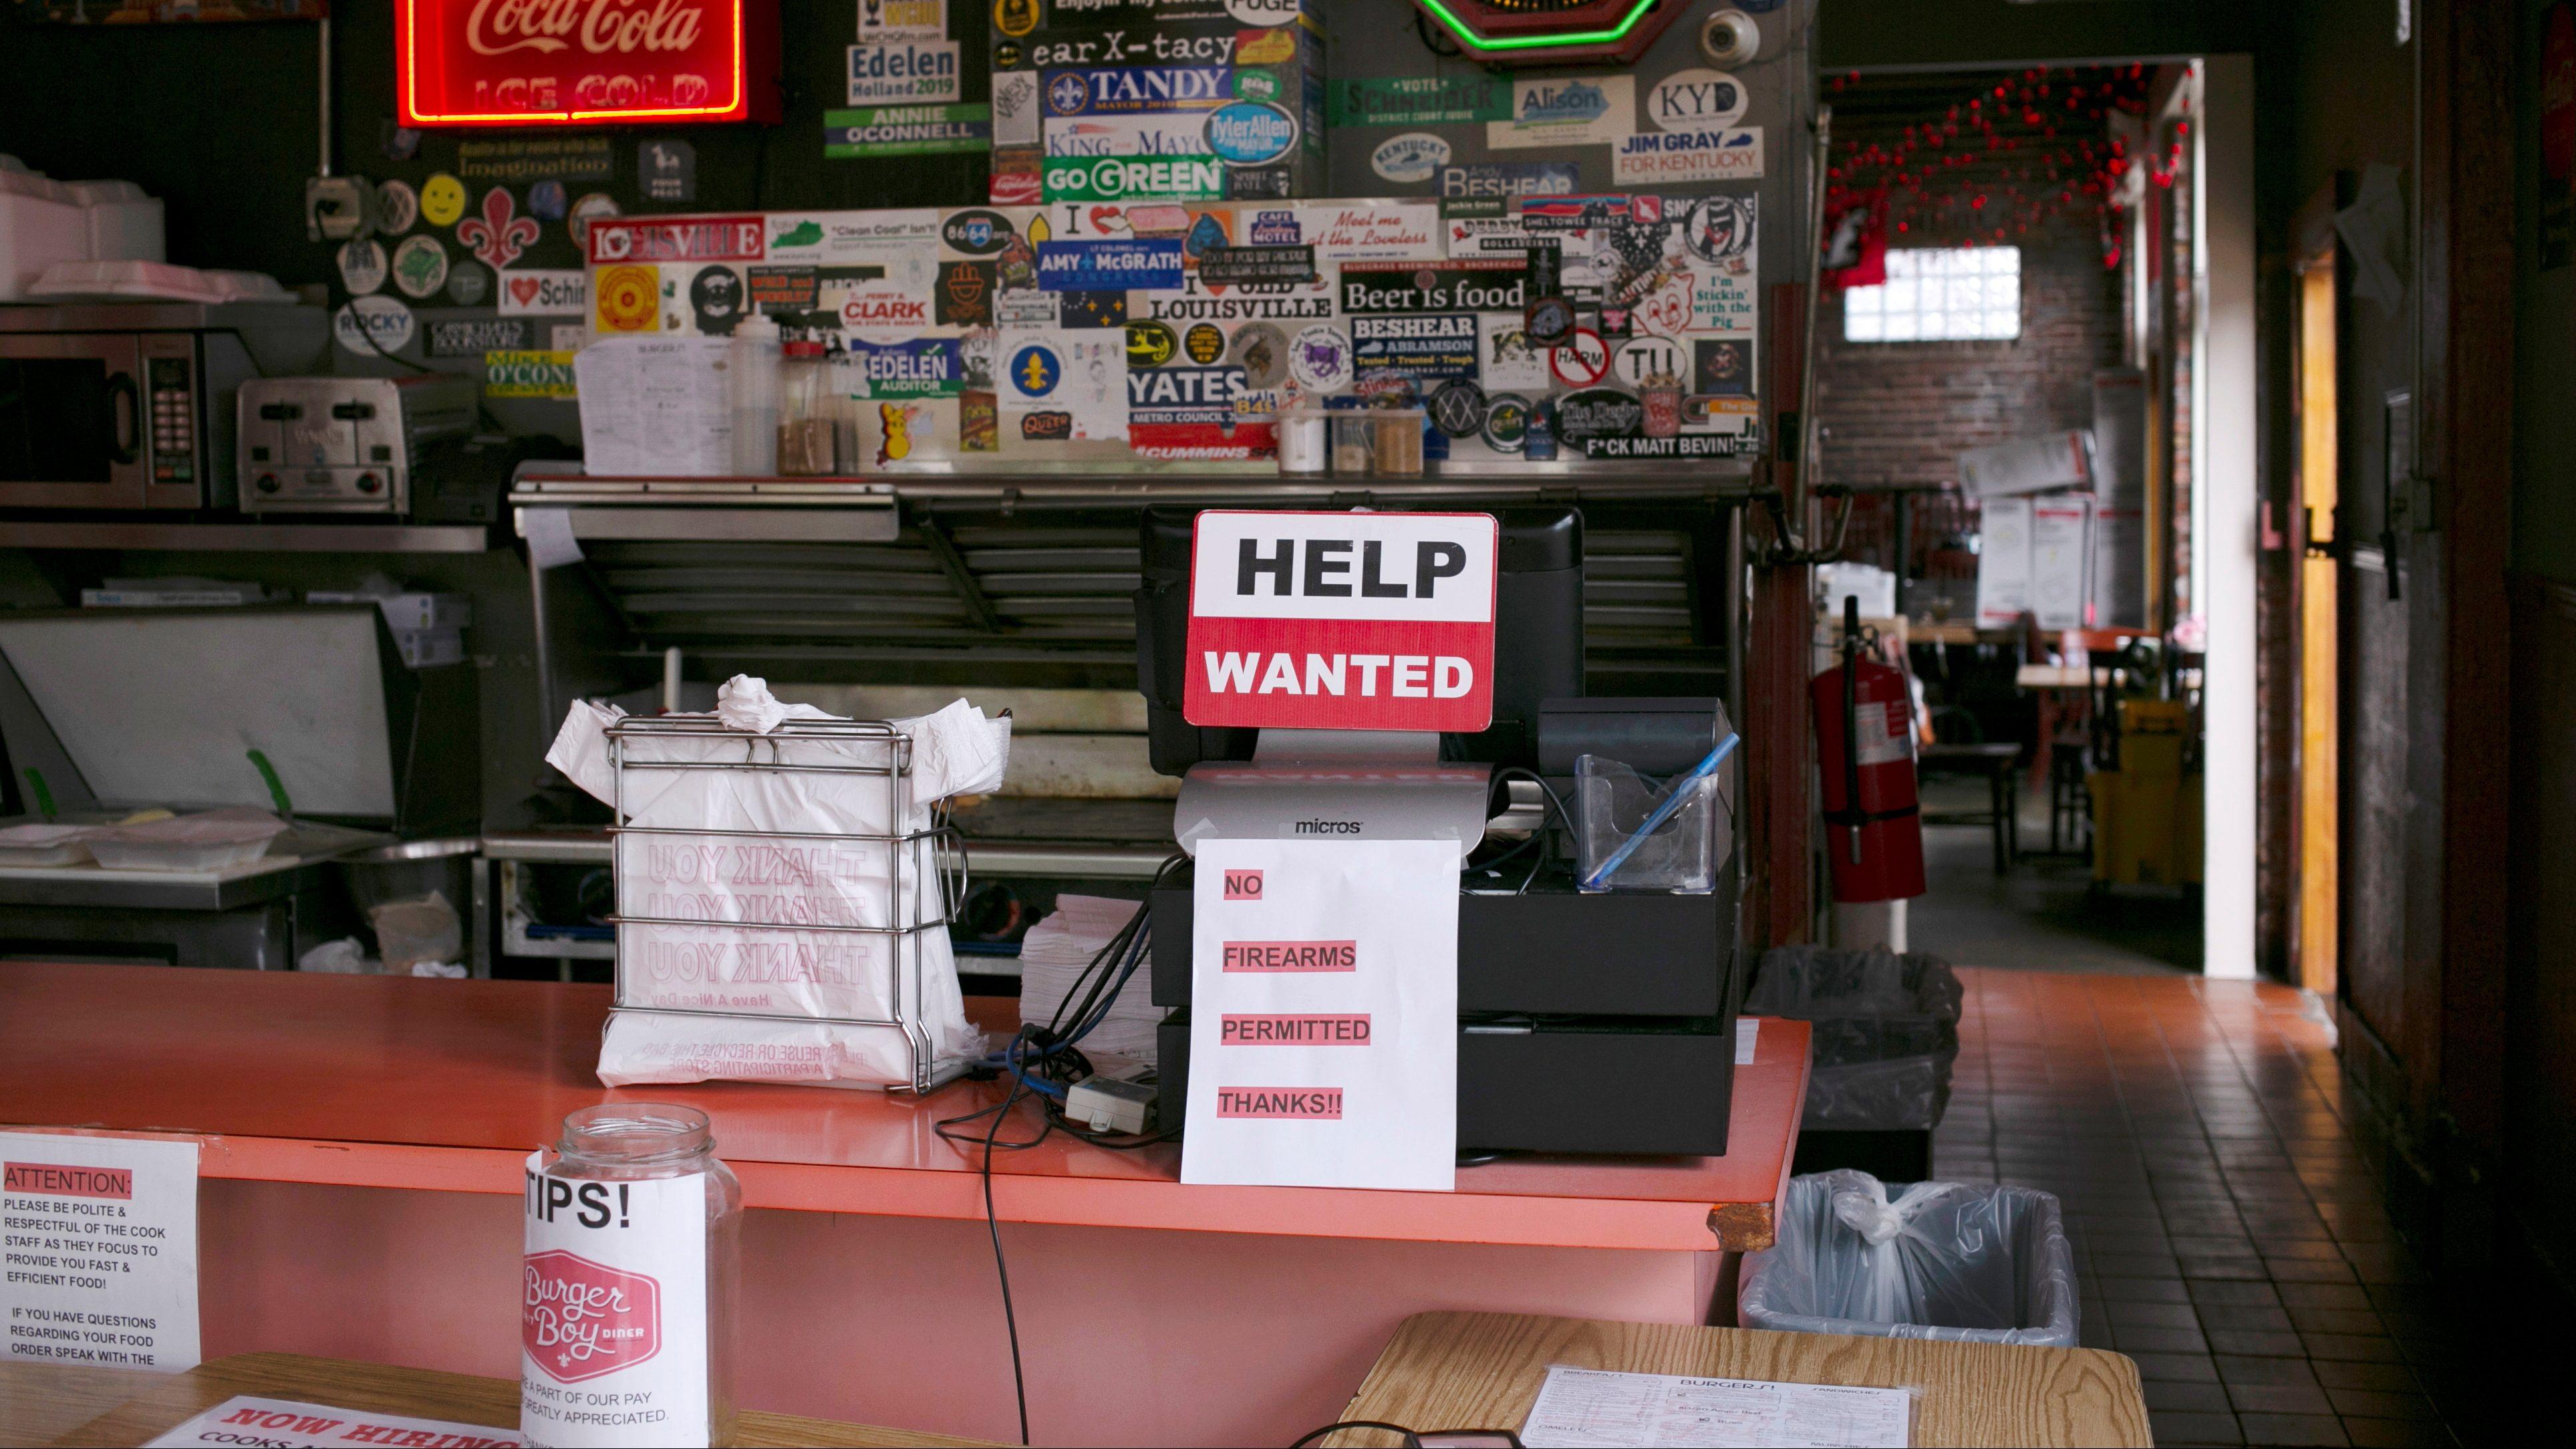 A hiring sign is seen at the register of Burger Boy restaurant.